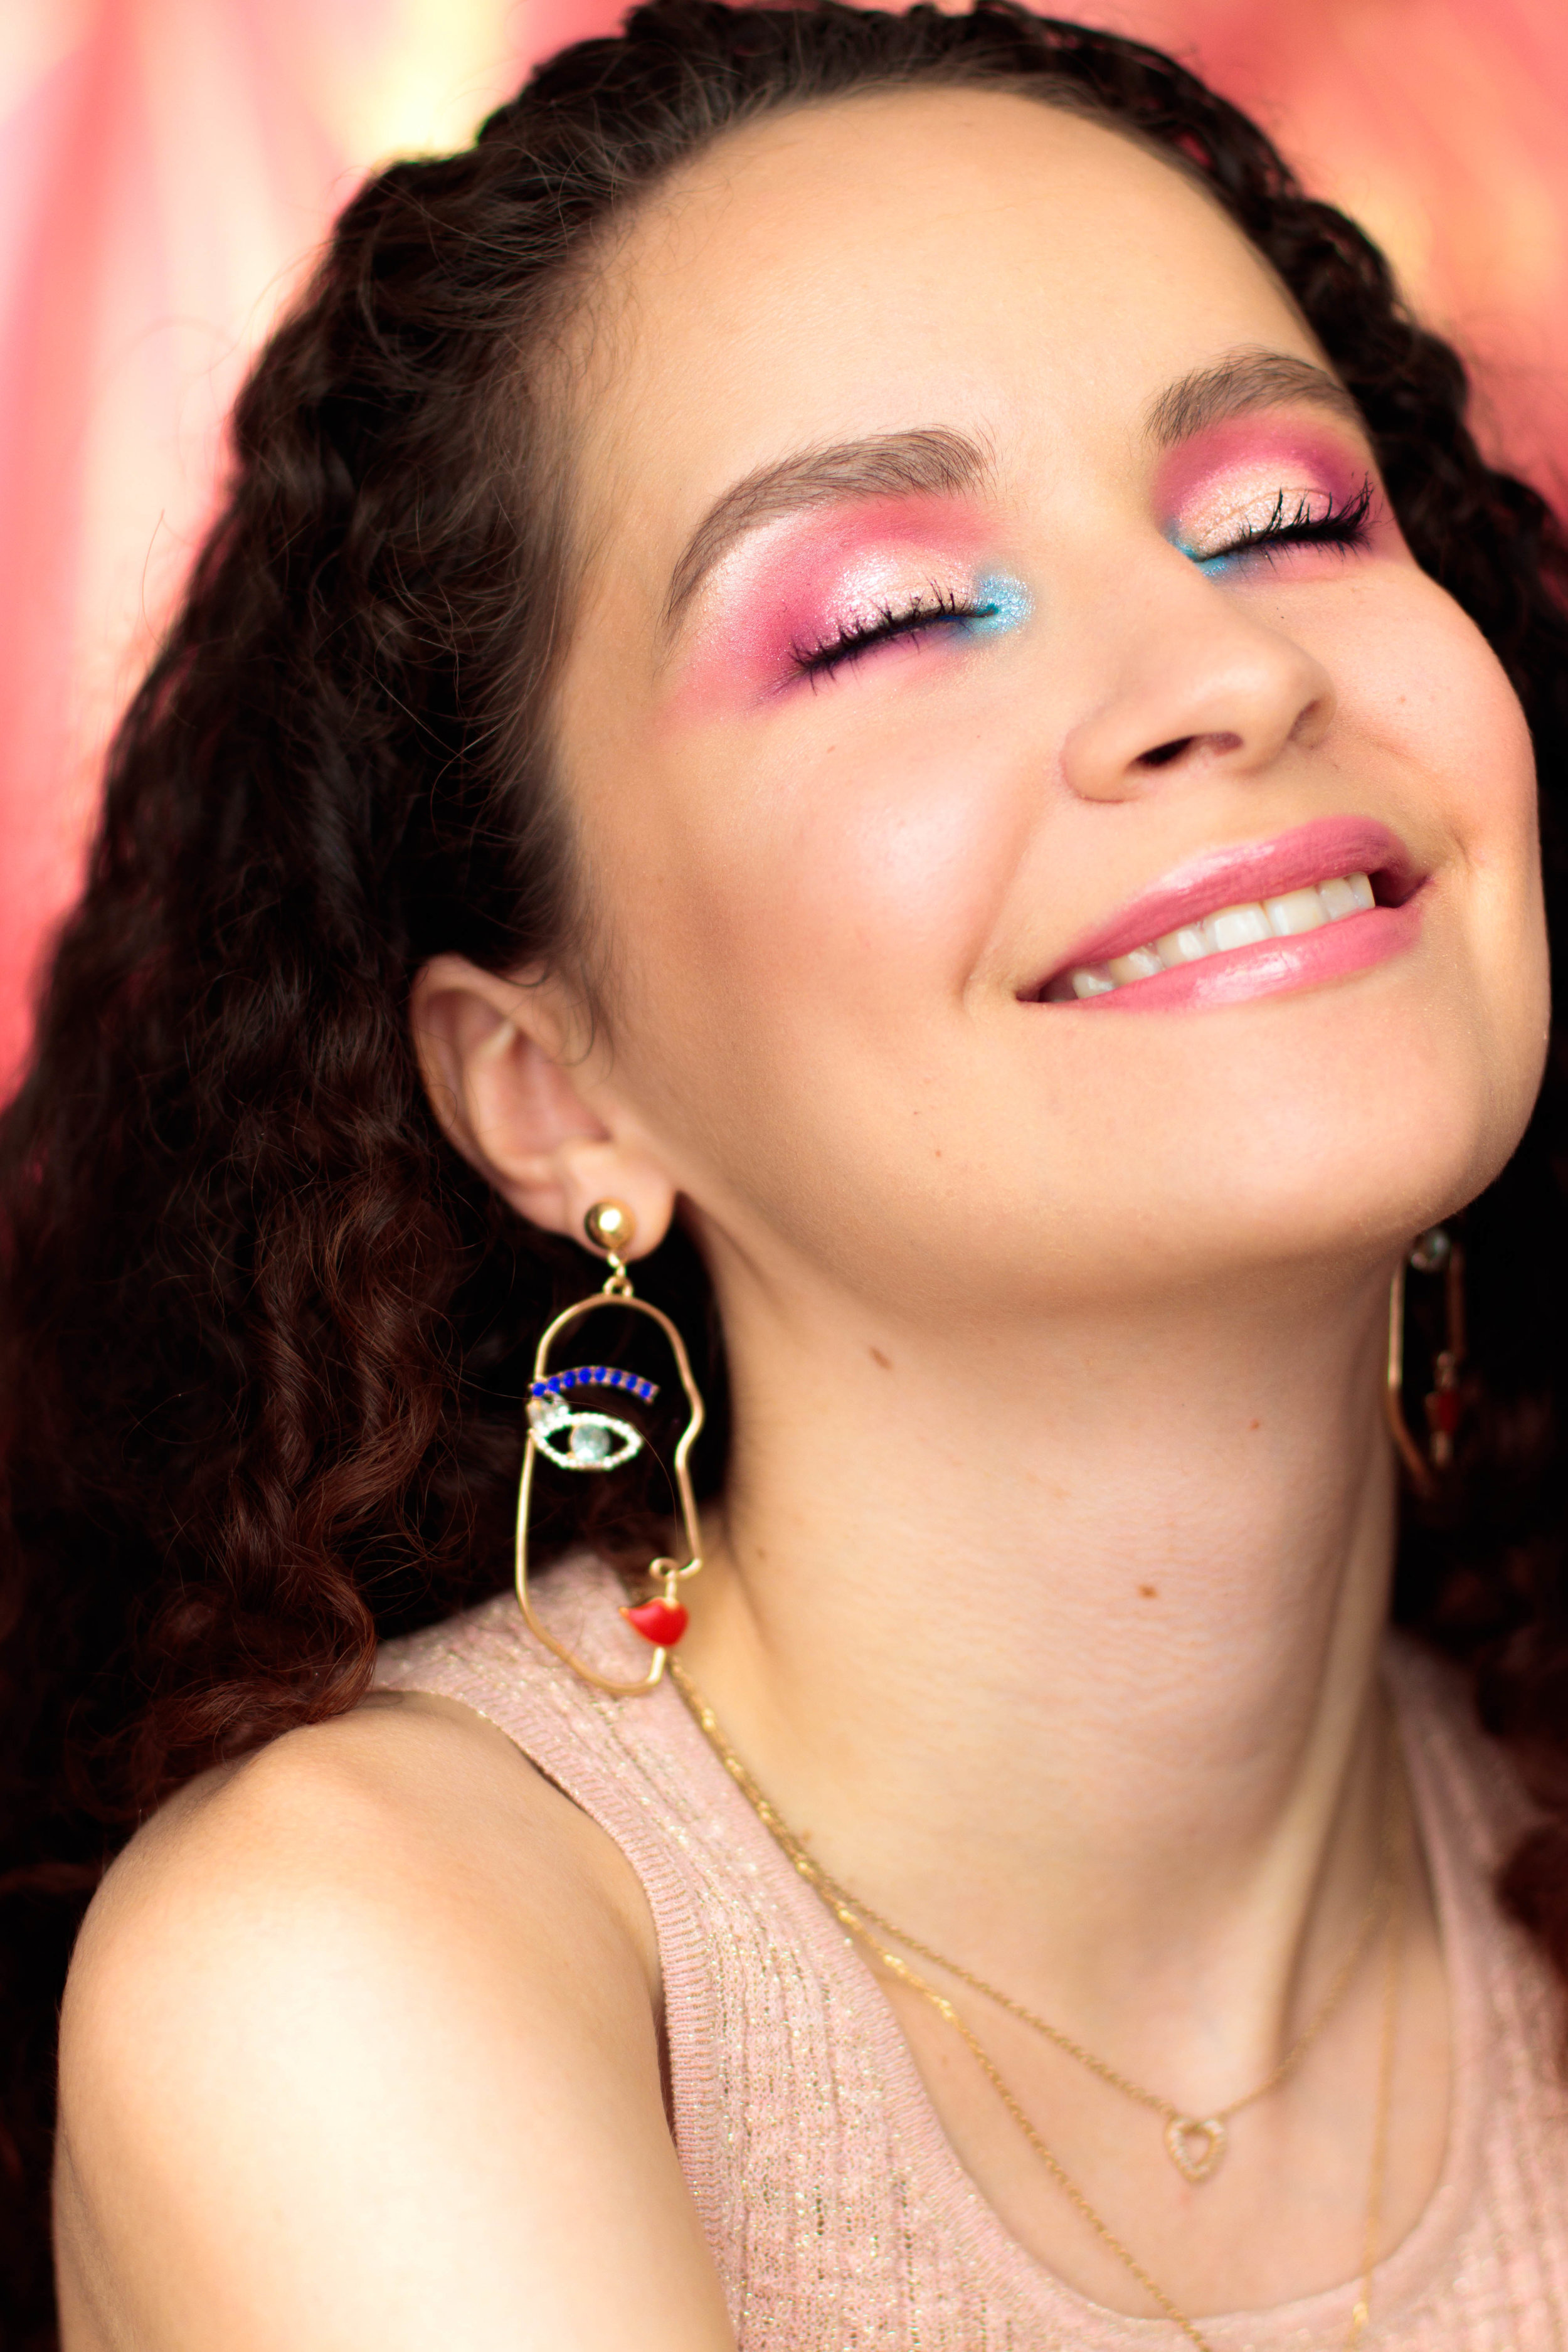 paradise-makeup-pauuulette-eyn-bright-matte-beauty-bay-5.jpg